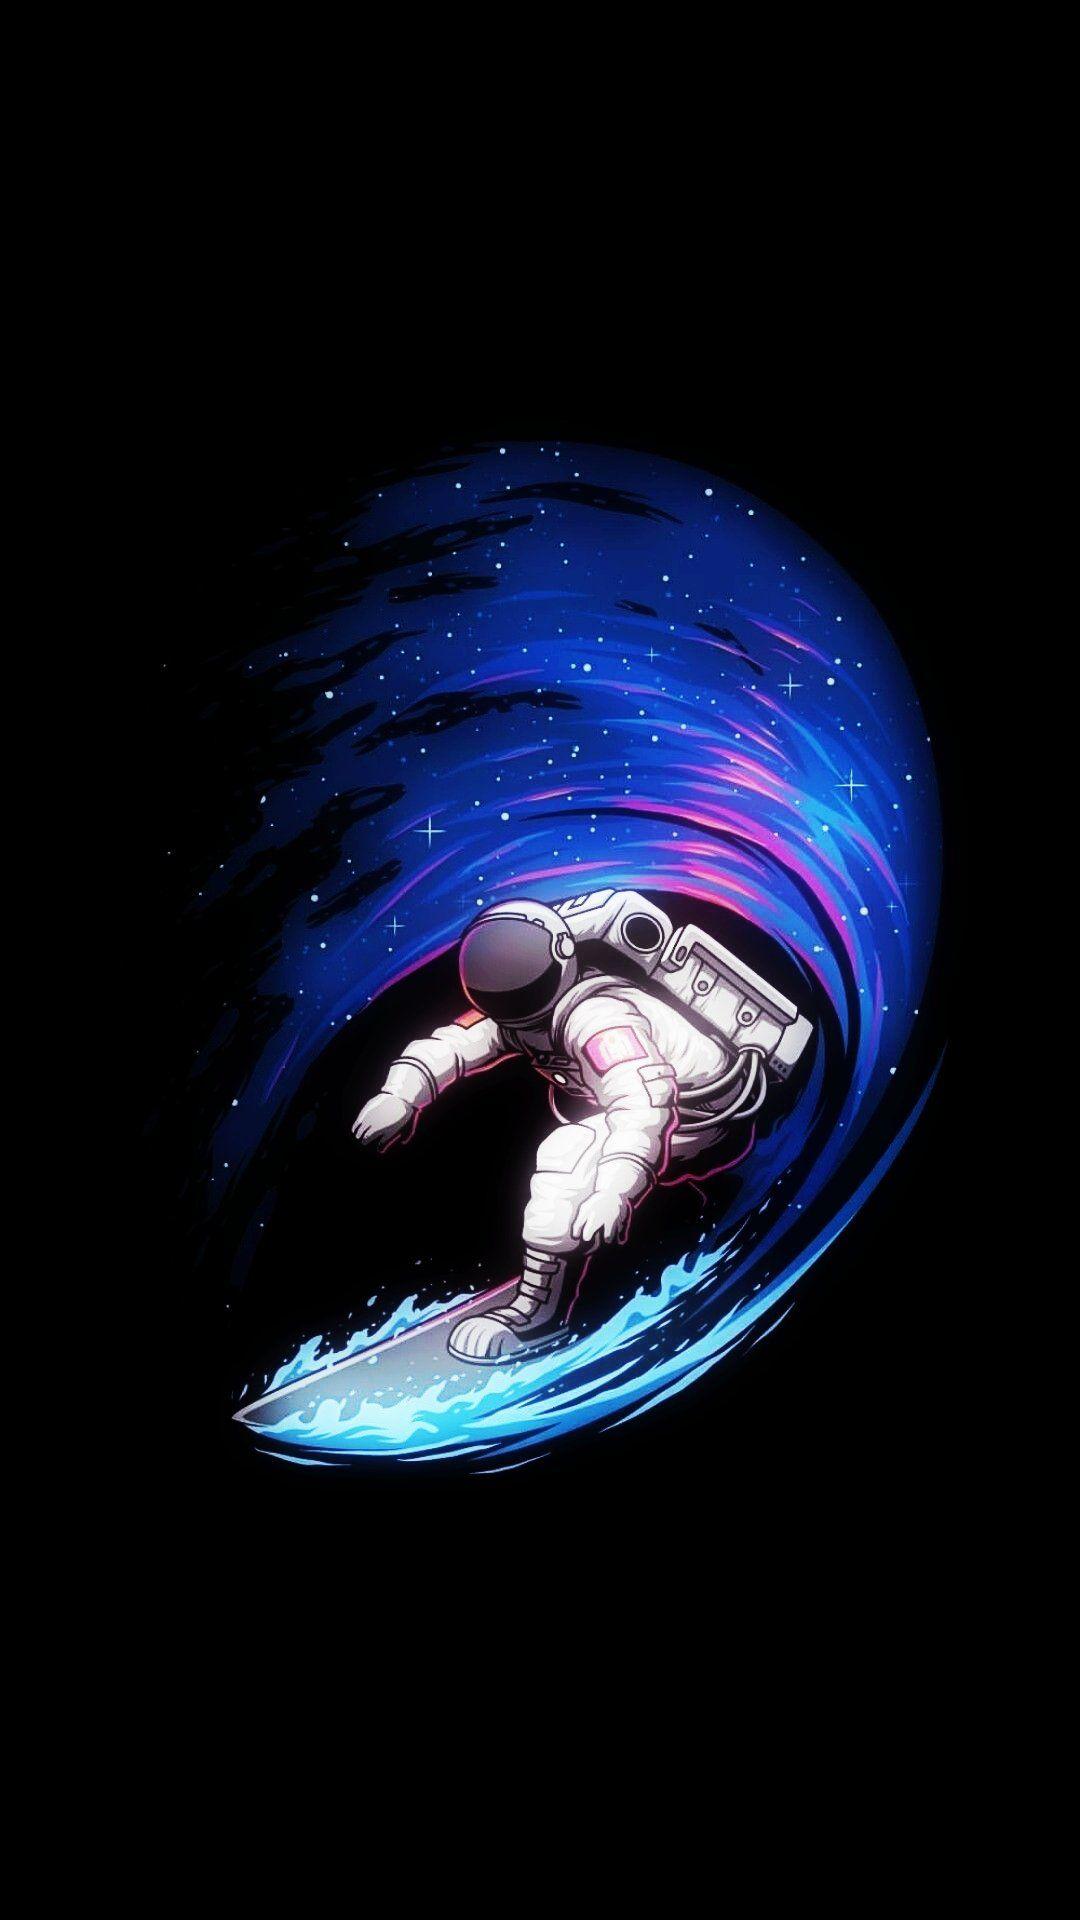 Astro Surfing Astronaut Wallpaper Pop Art Wallpaper Space Artwork